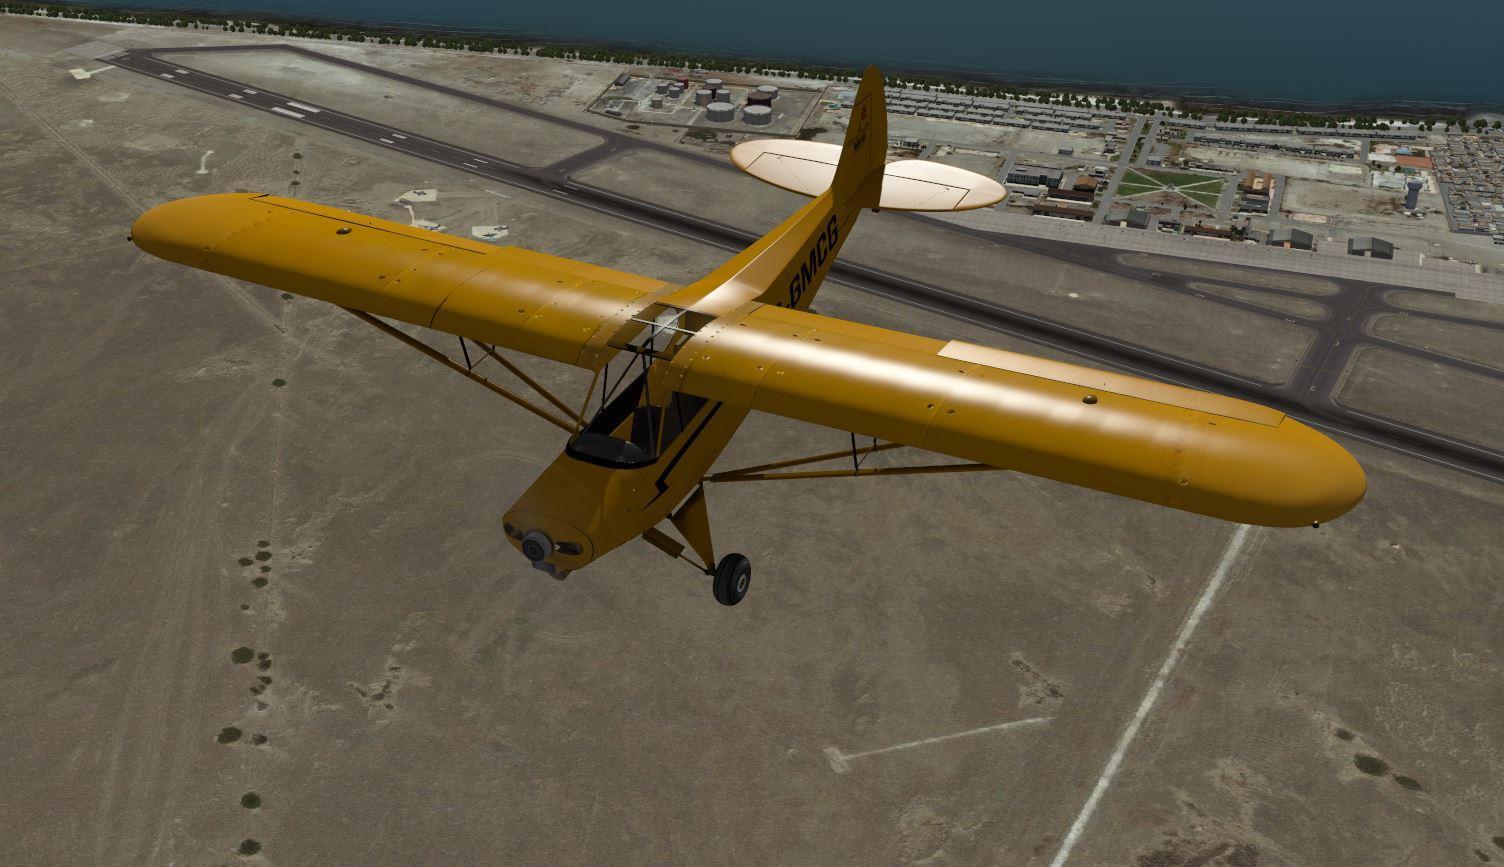 PA-18 Super Cub Series by AeroSim Dev Group - Airplane